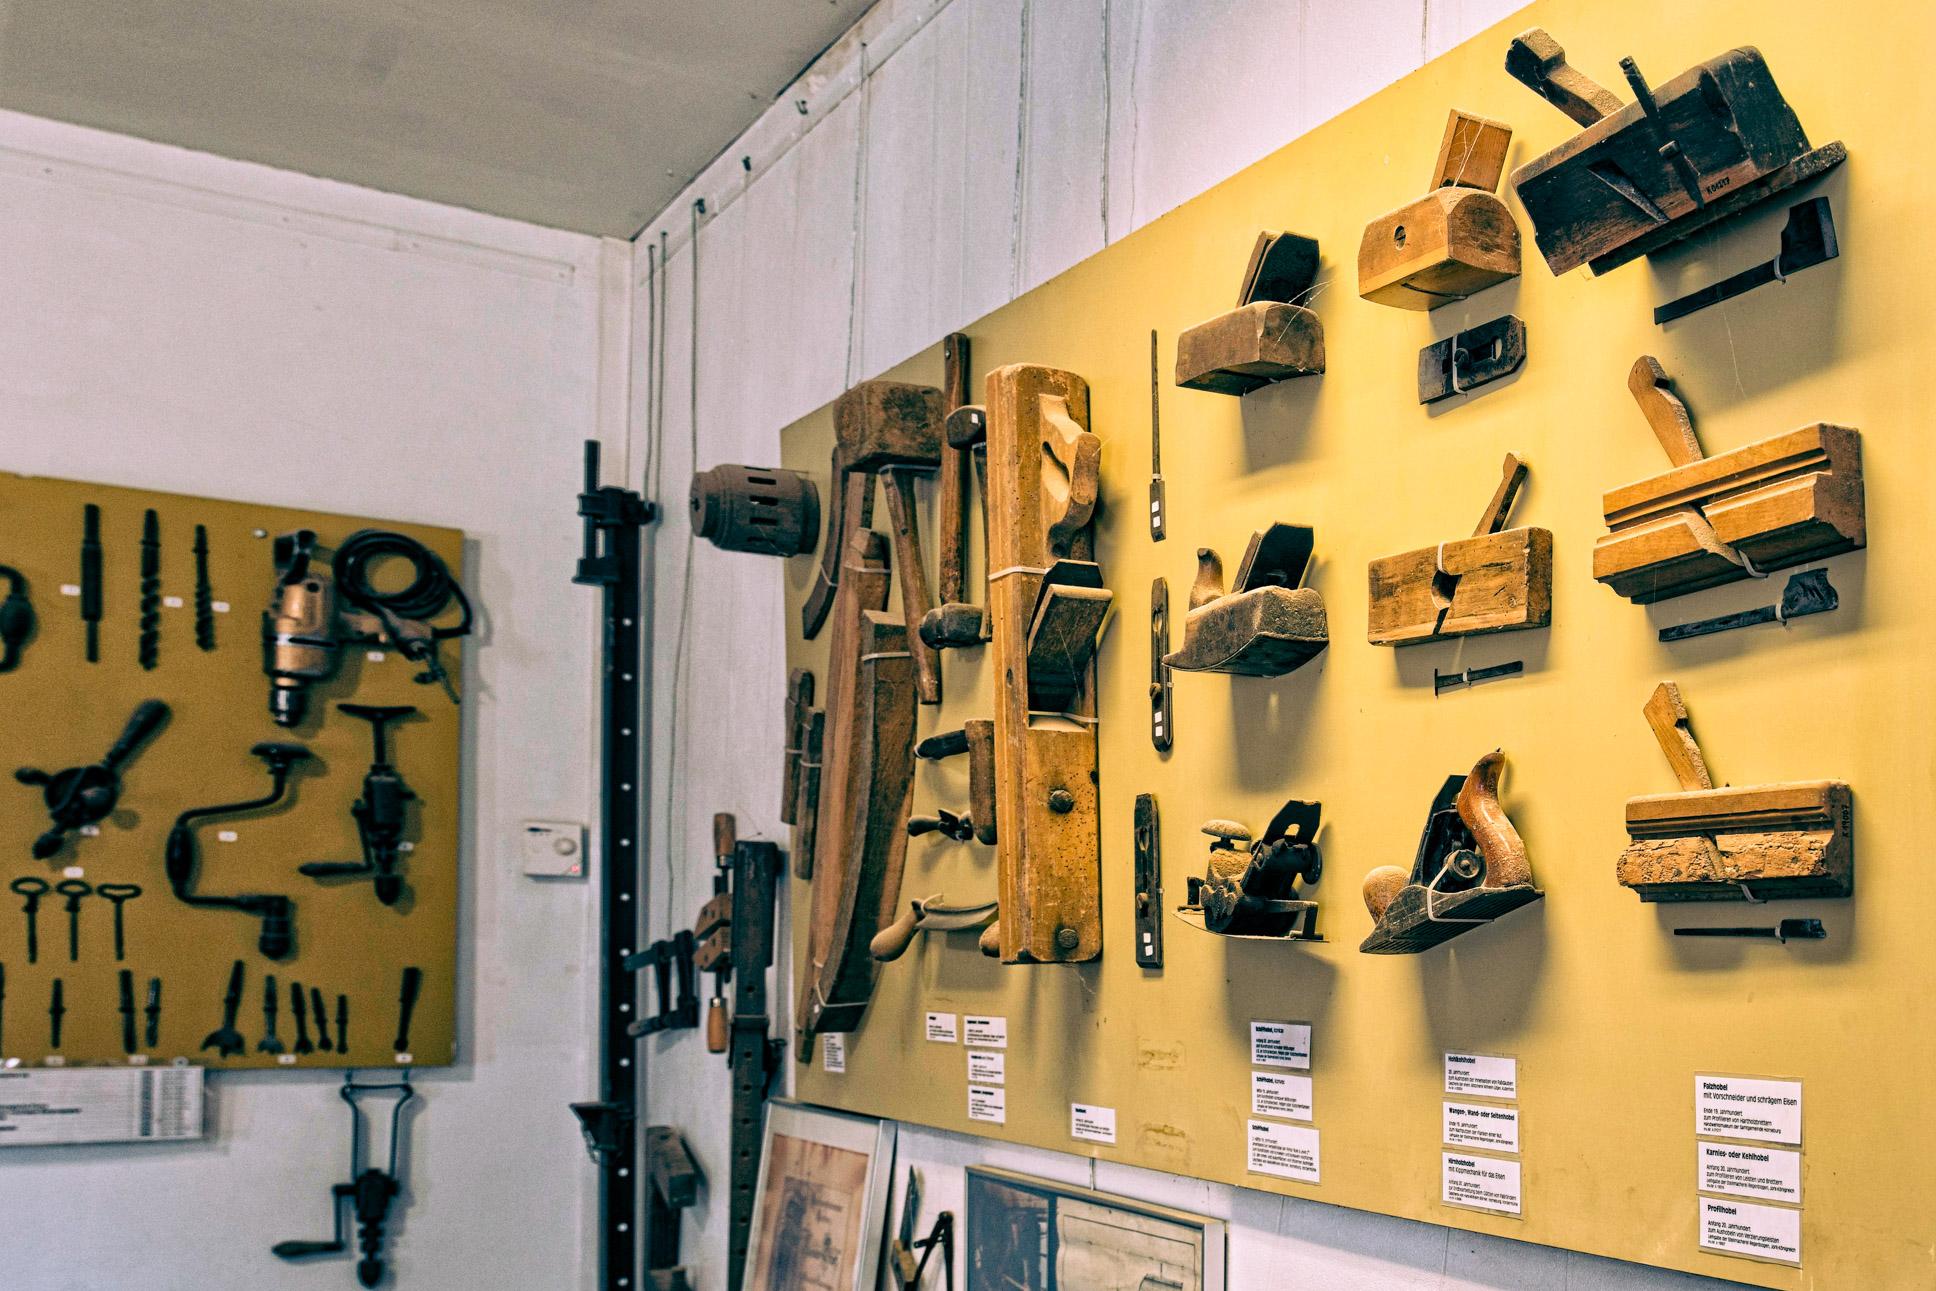 Handwerksmuseum-Horneburg-Rundgang2018-2857-Bearbeitet-20